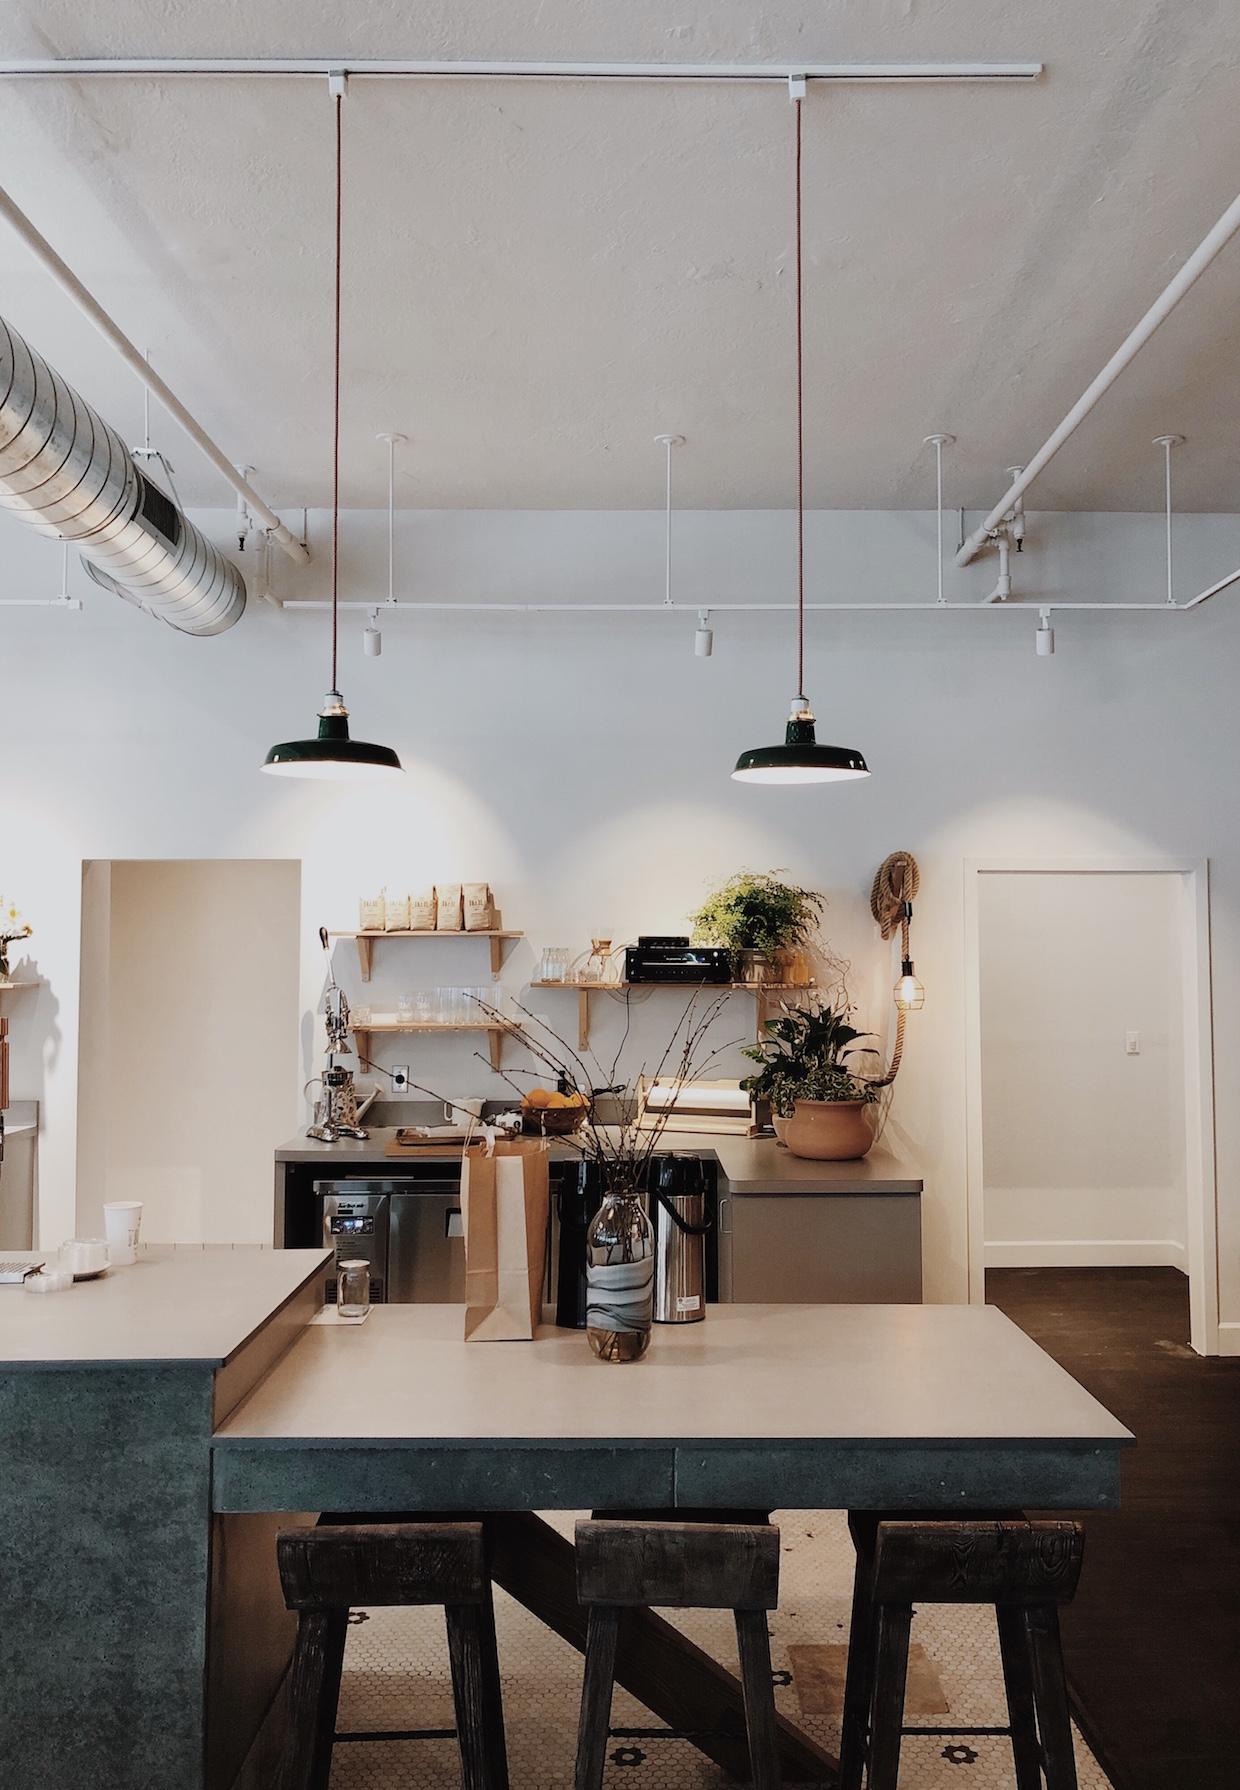 Trail roasters inside coffee bar